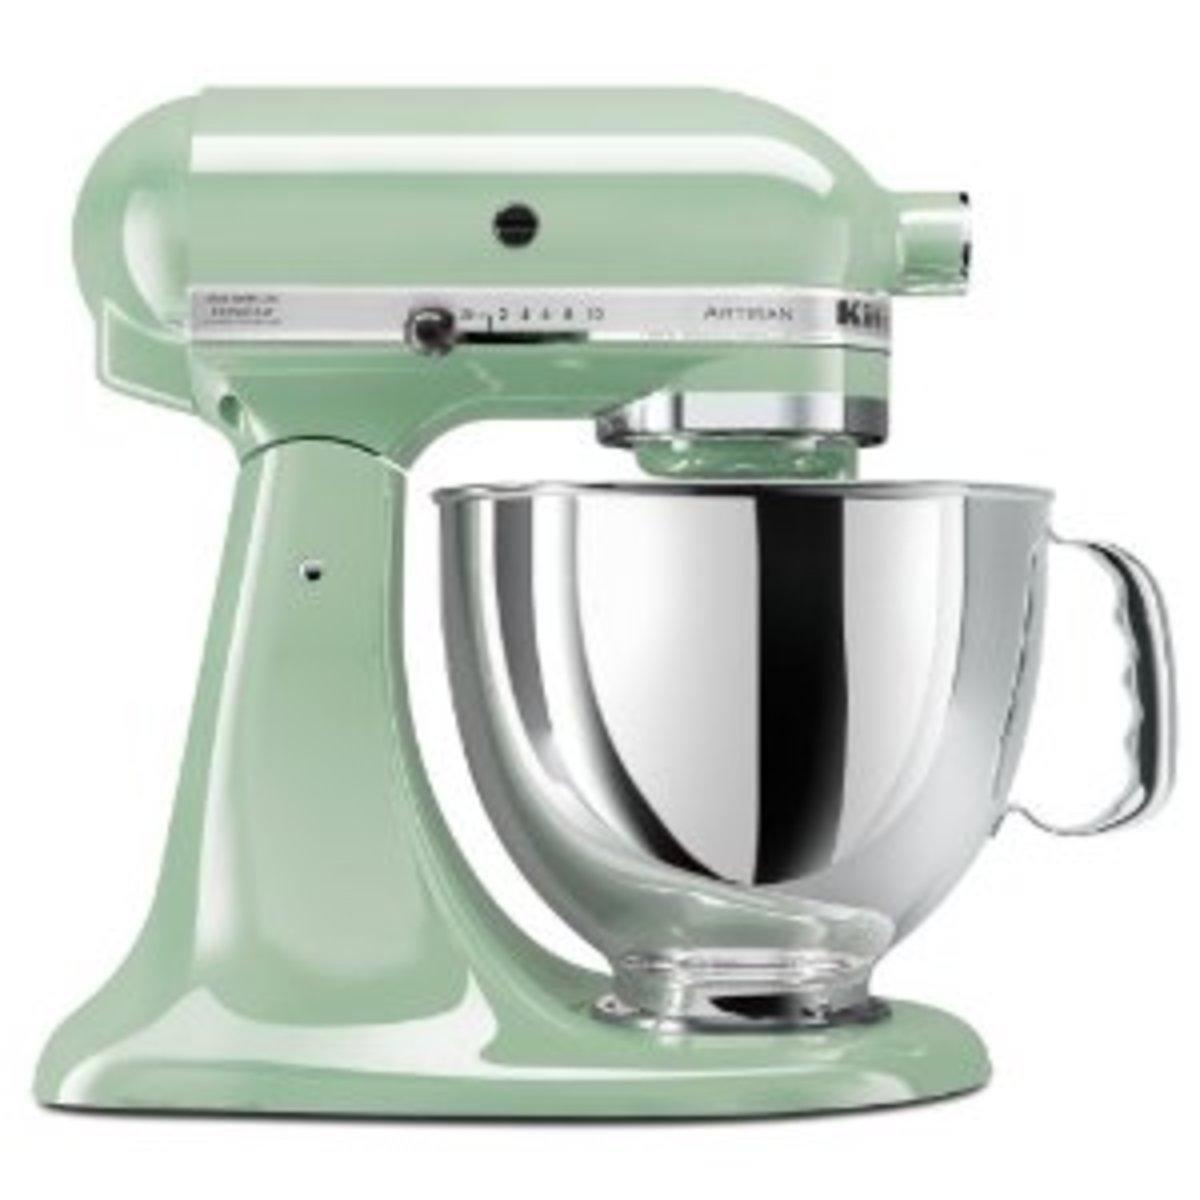 Vintage Inspired KitchenAid mixer